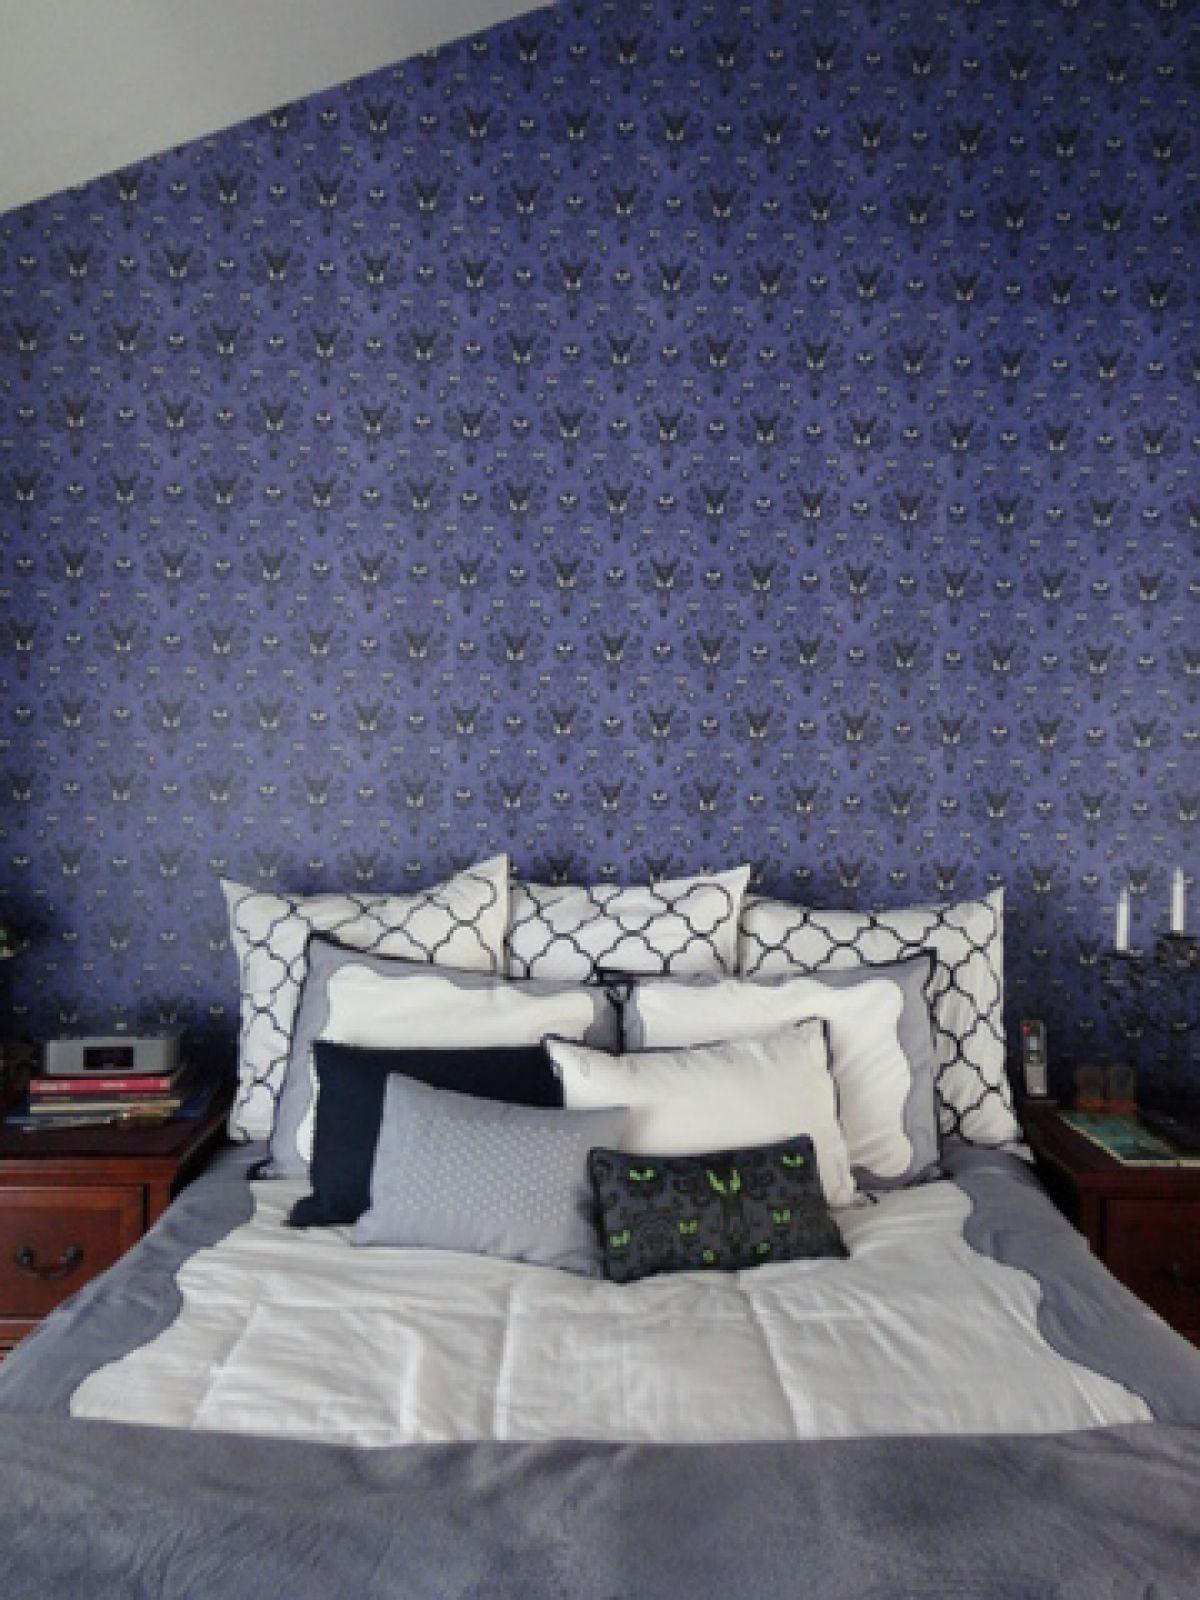 Dream Room: A Disney Haunted Mansion Bedroom   Haunted ...  Haunted Mansion Themed Bedroom